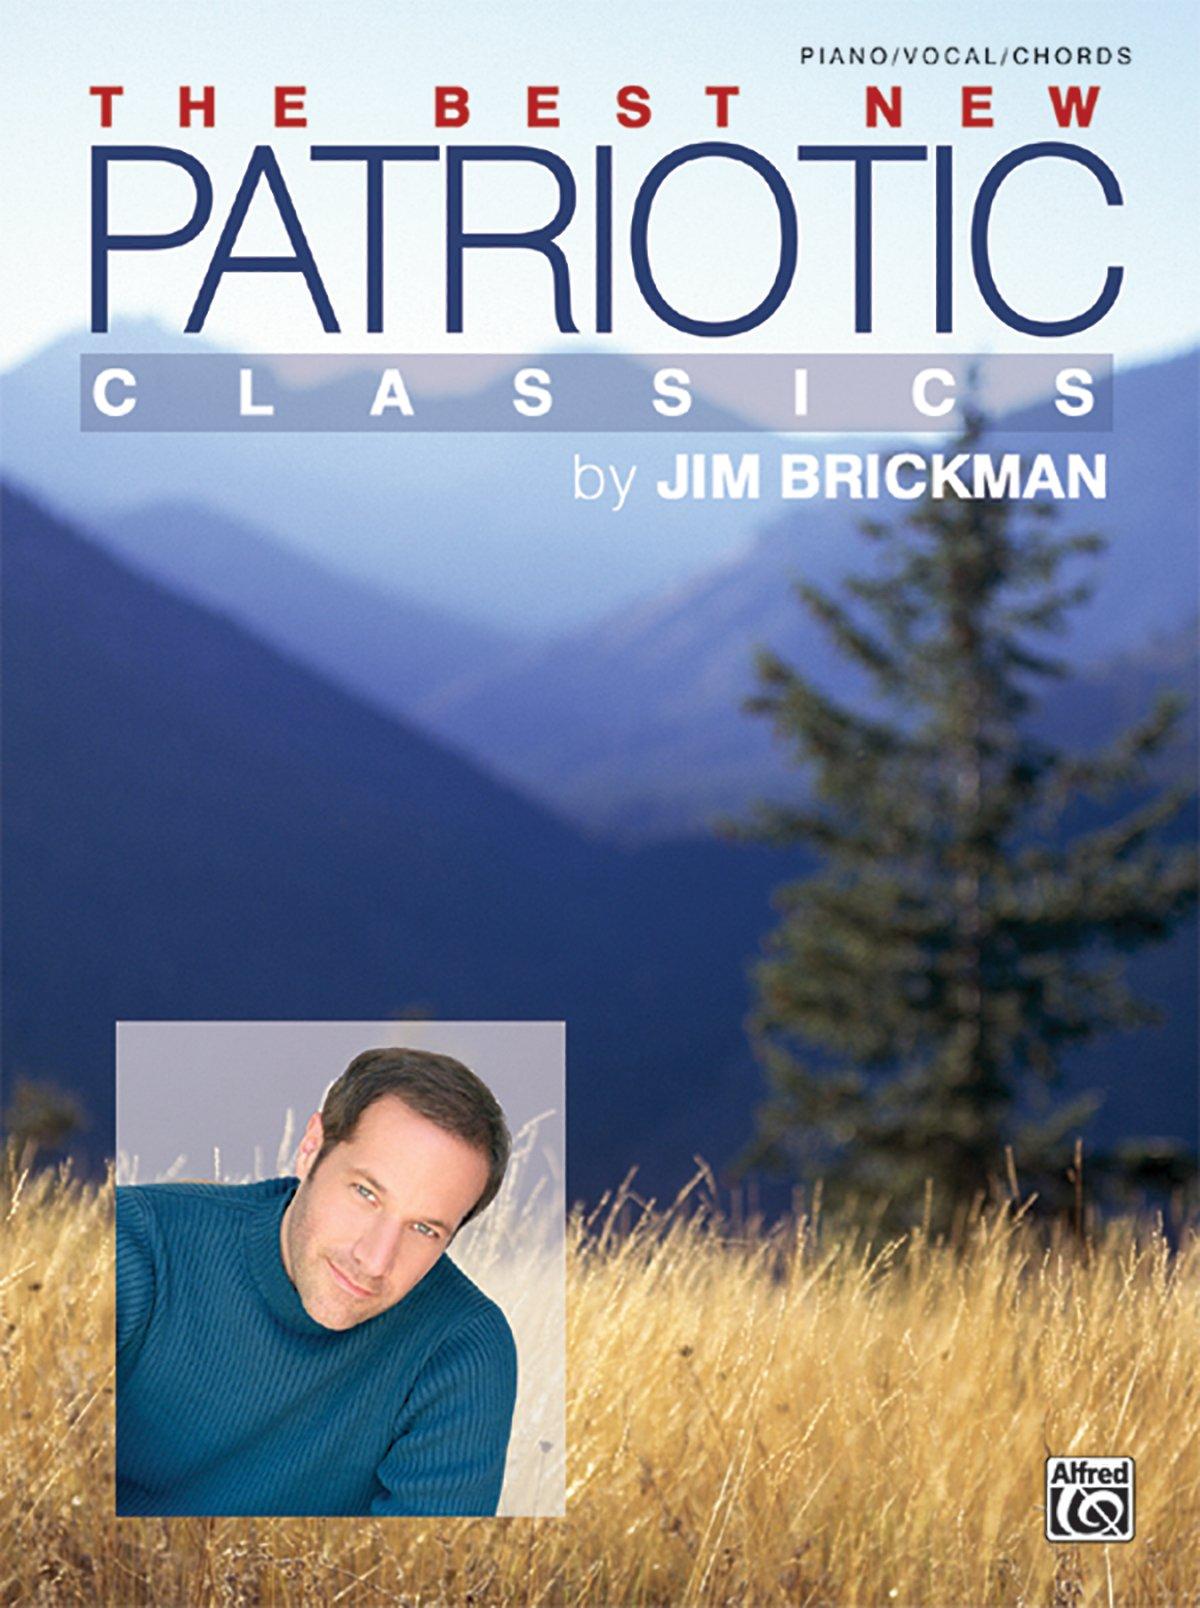 The Best New Patriotic Classics: Piano/vocal/chords